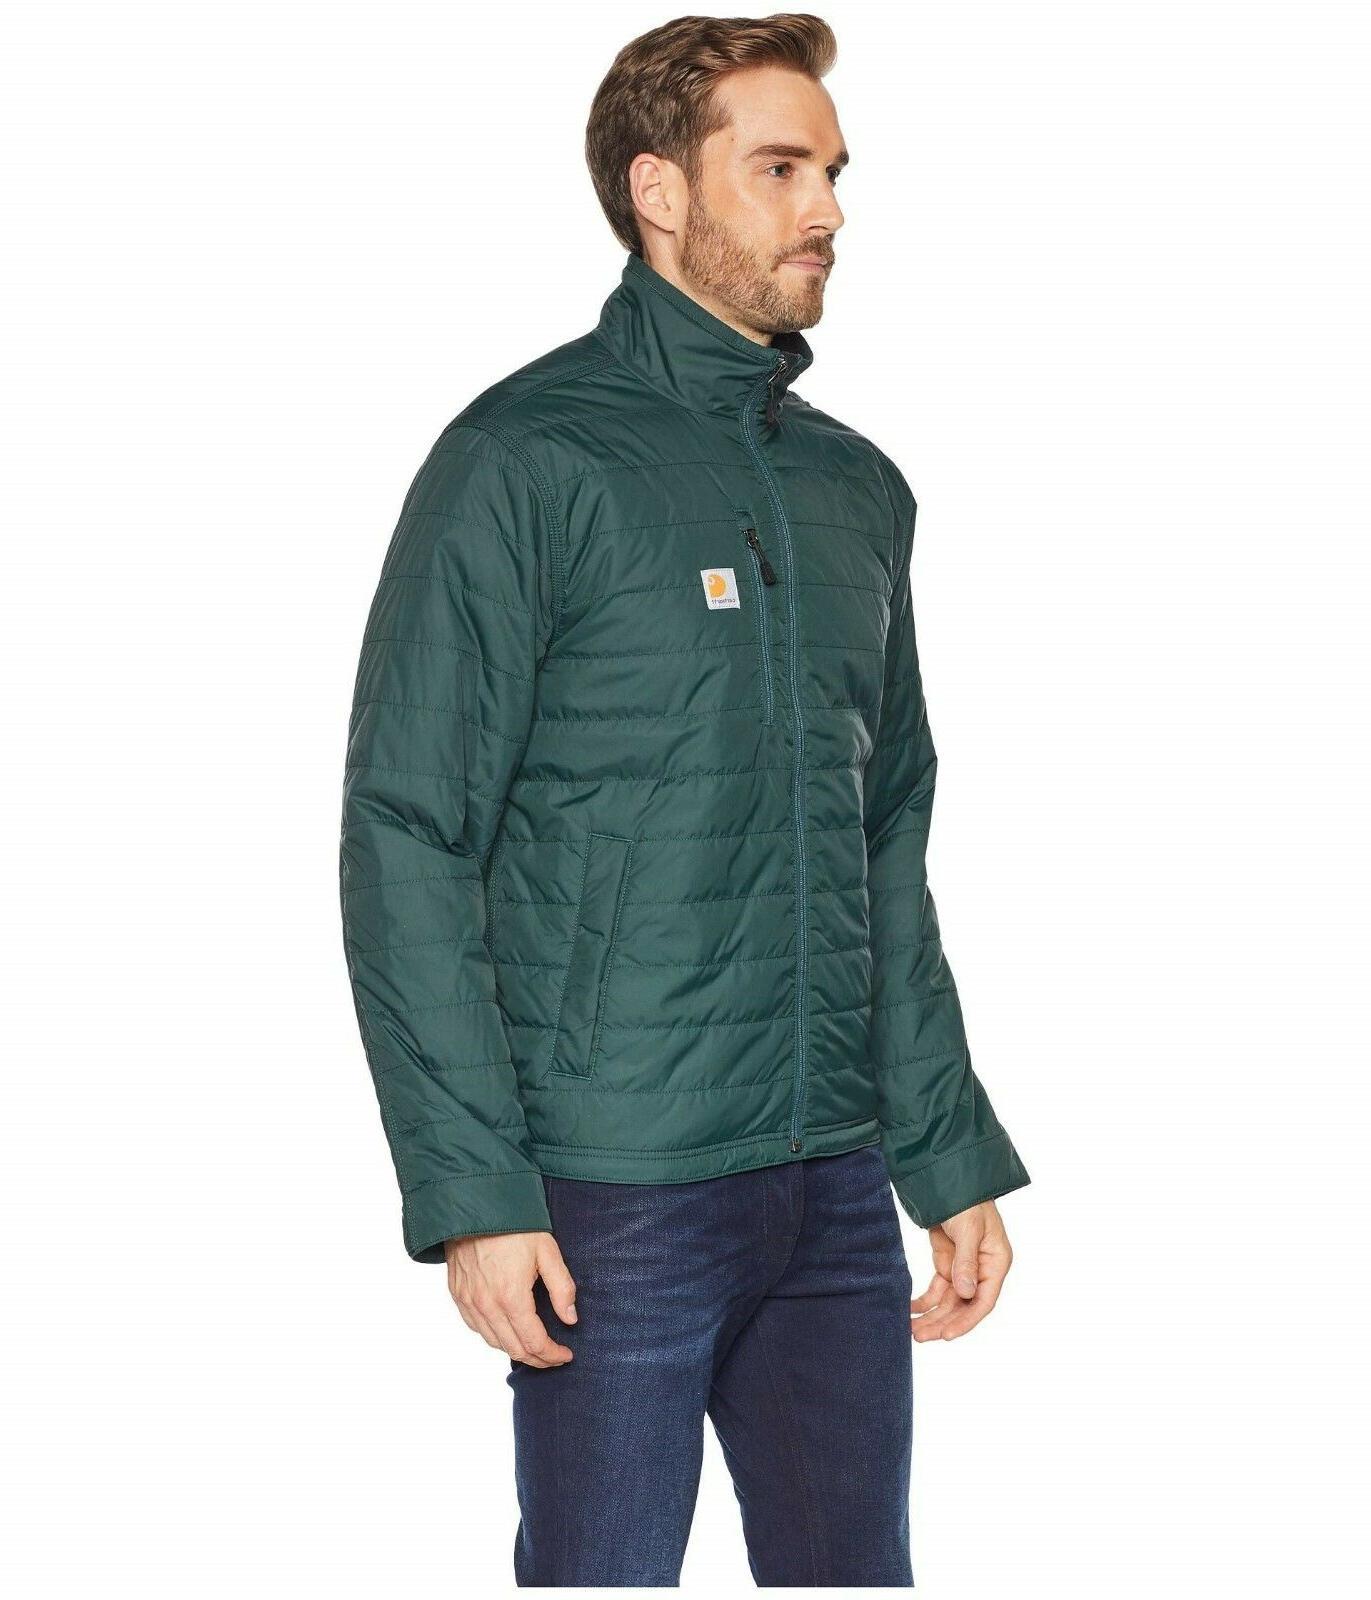 Carhartt Gilliam Men's Jacket 102208 Rain Defender Quilted C